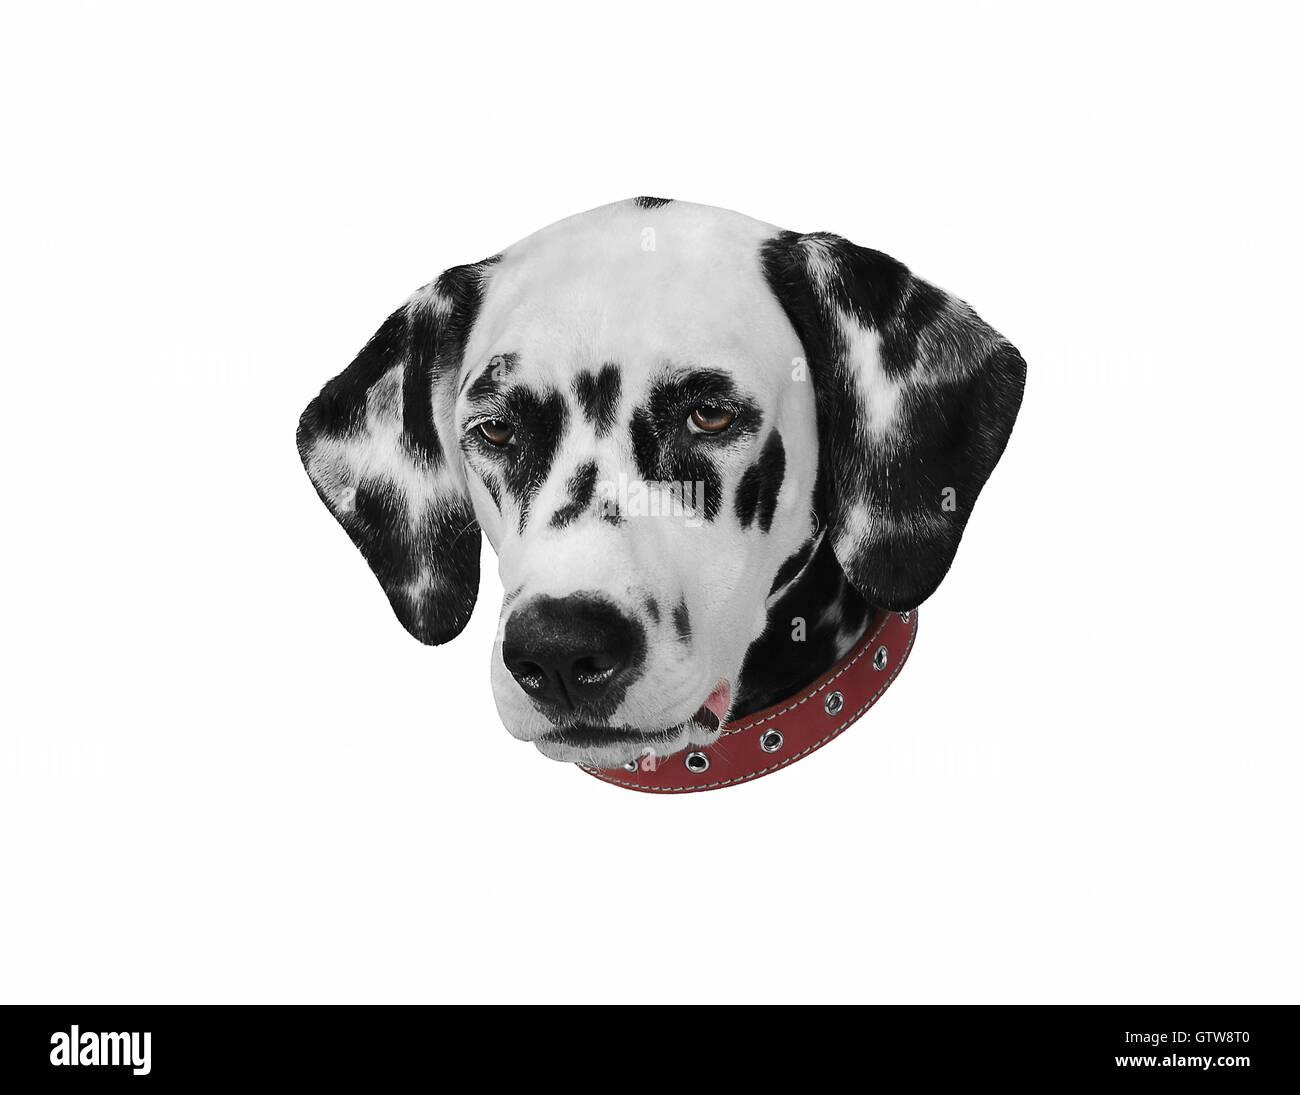 Dalmatian black and white portrait isolate studio photo - Stock Image